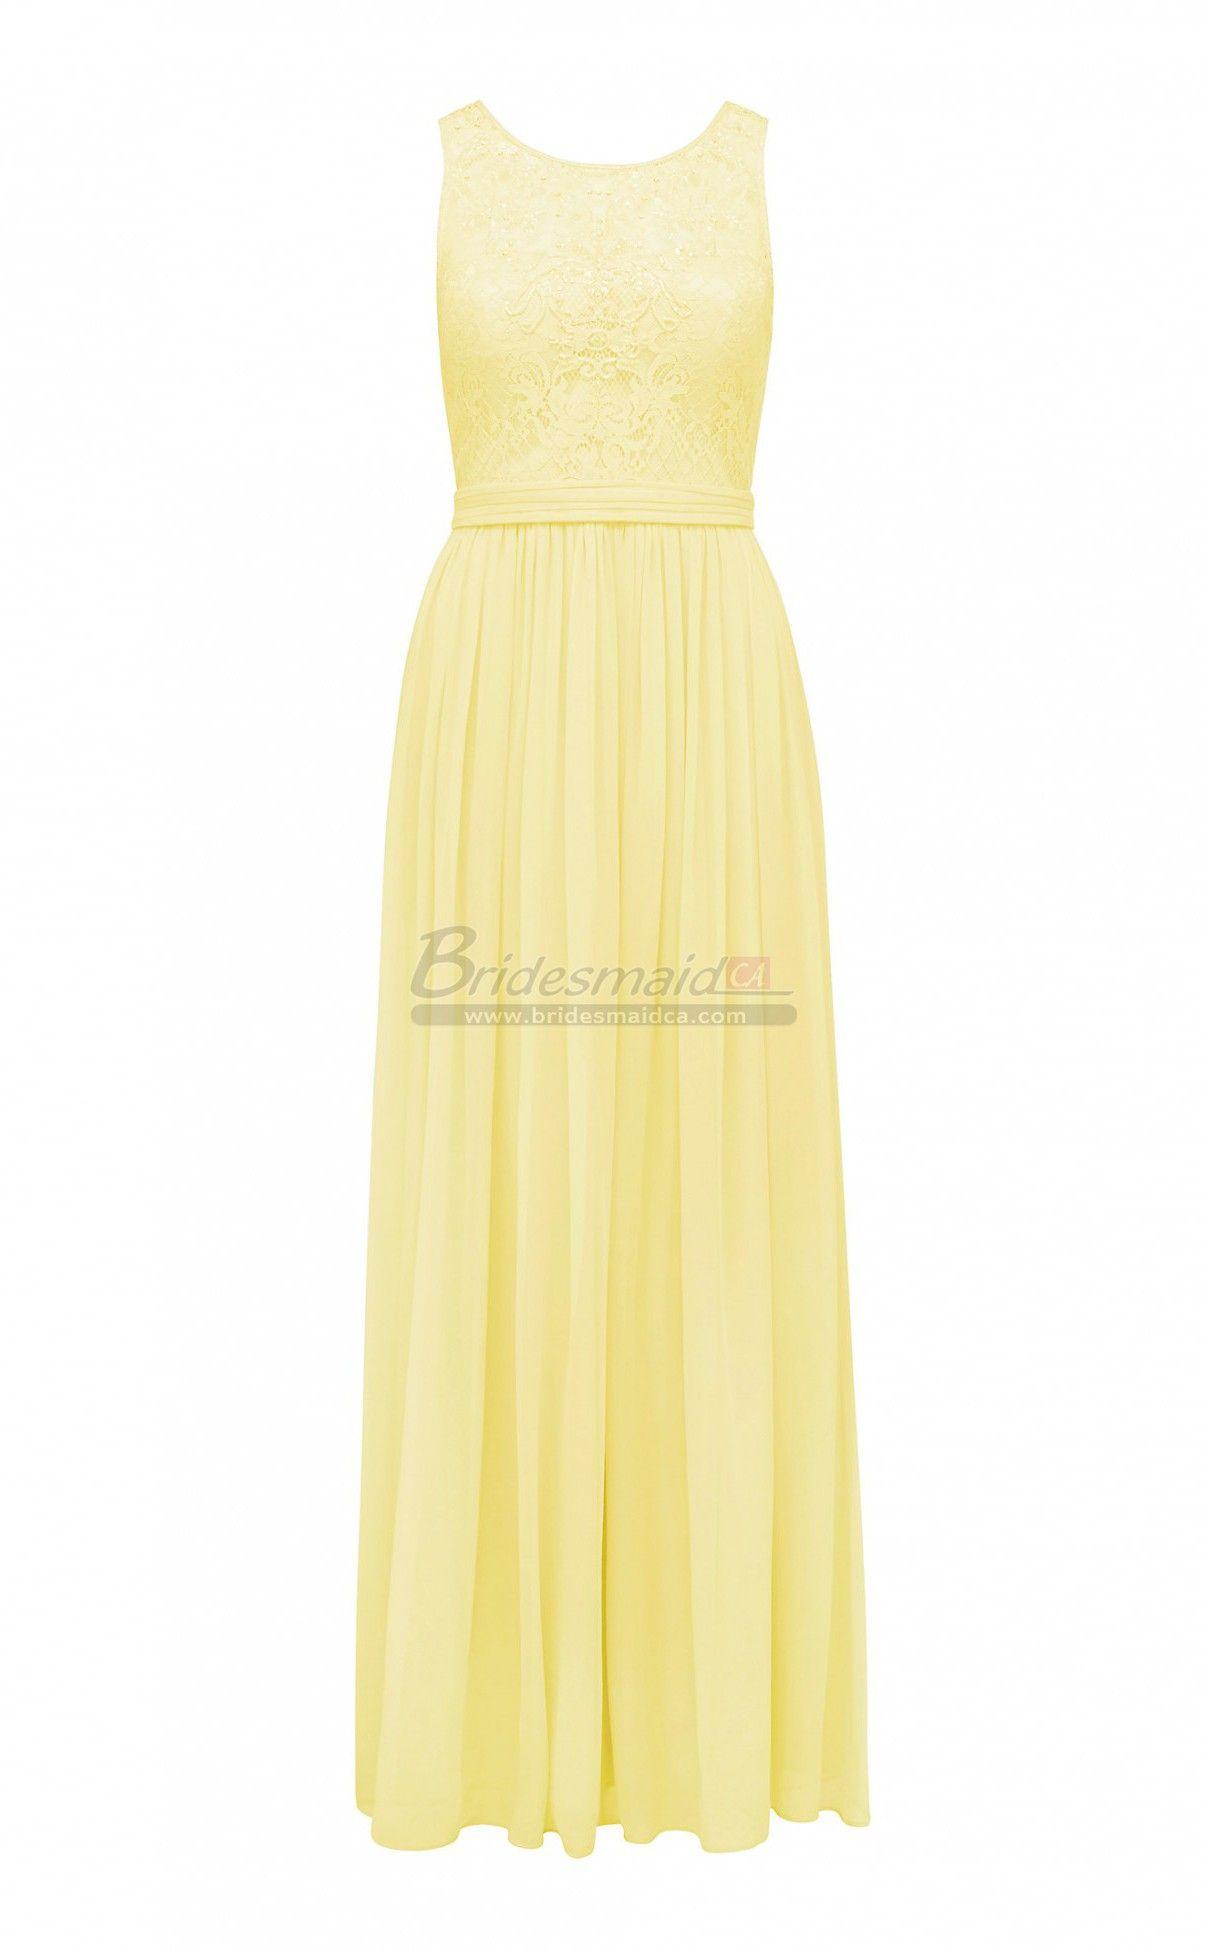 Bridesmaid jewel neck chiffon and lace long yellow vintage